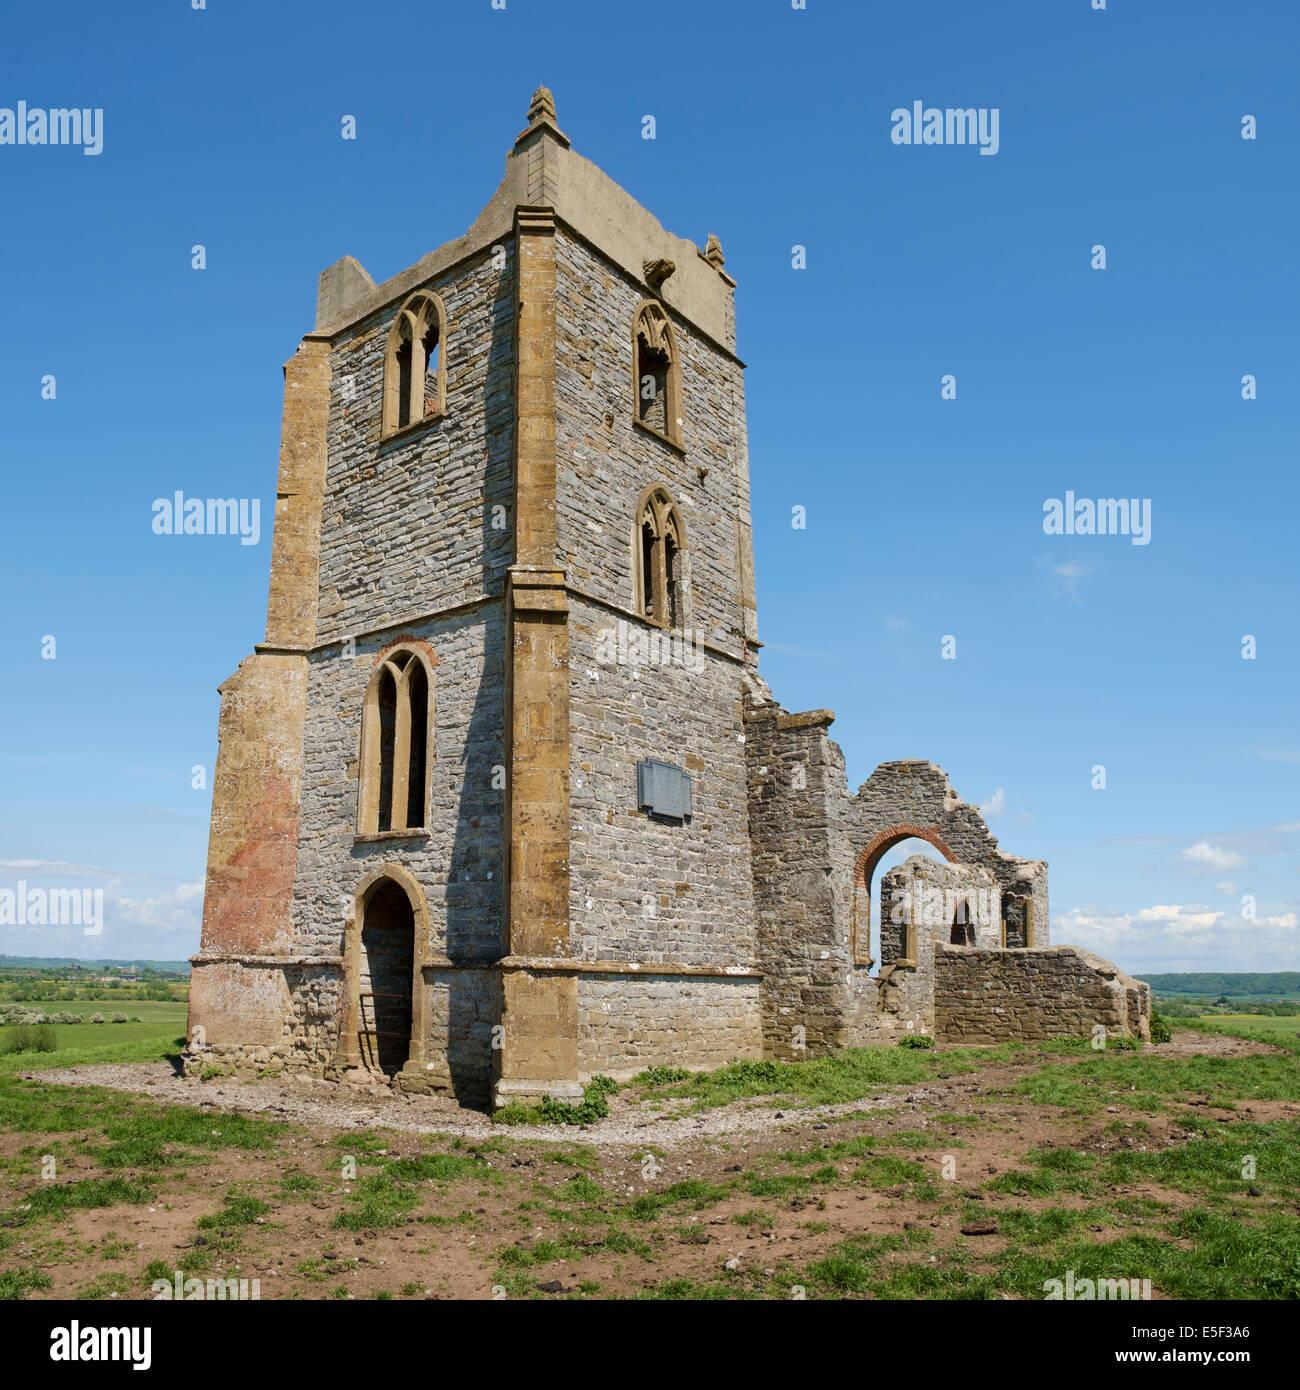 Old ruined church on top of Burrow Mump hill, Burrowbridge, Somerset, England, UK - Stock Image